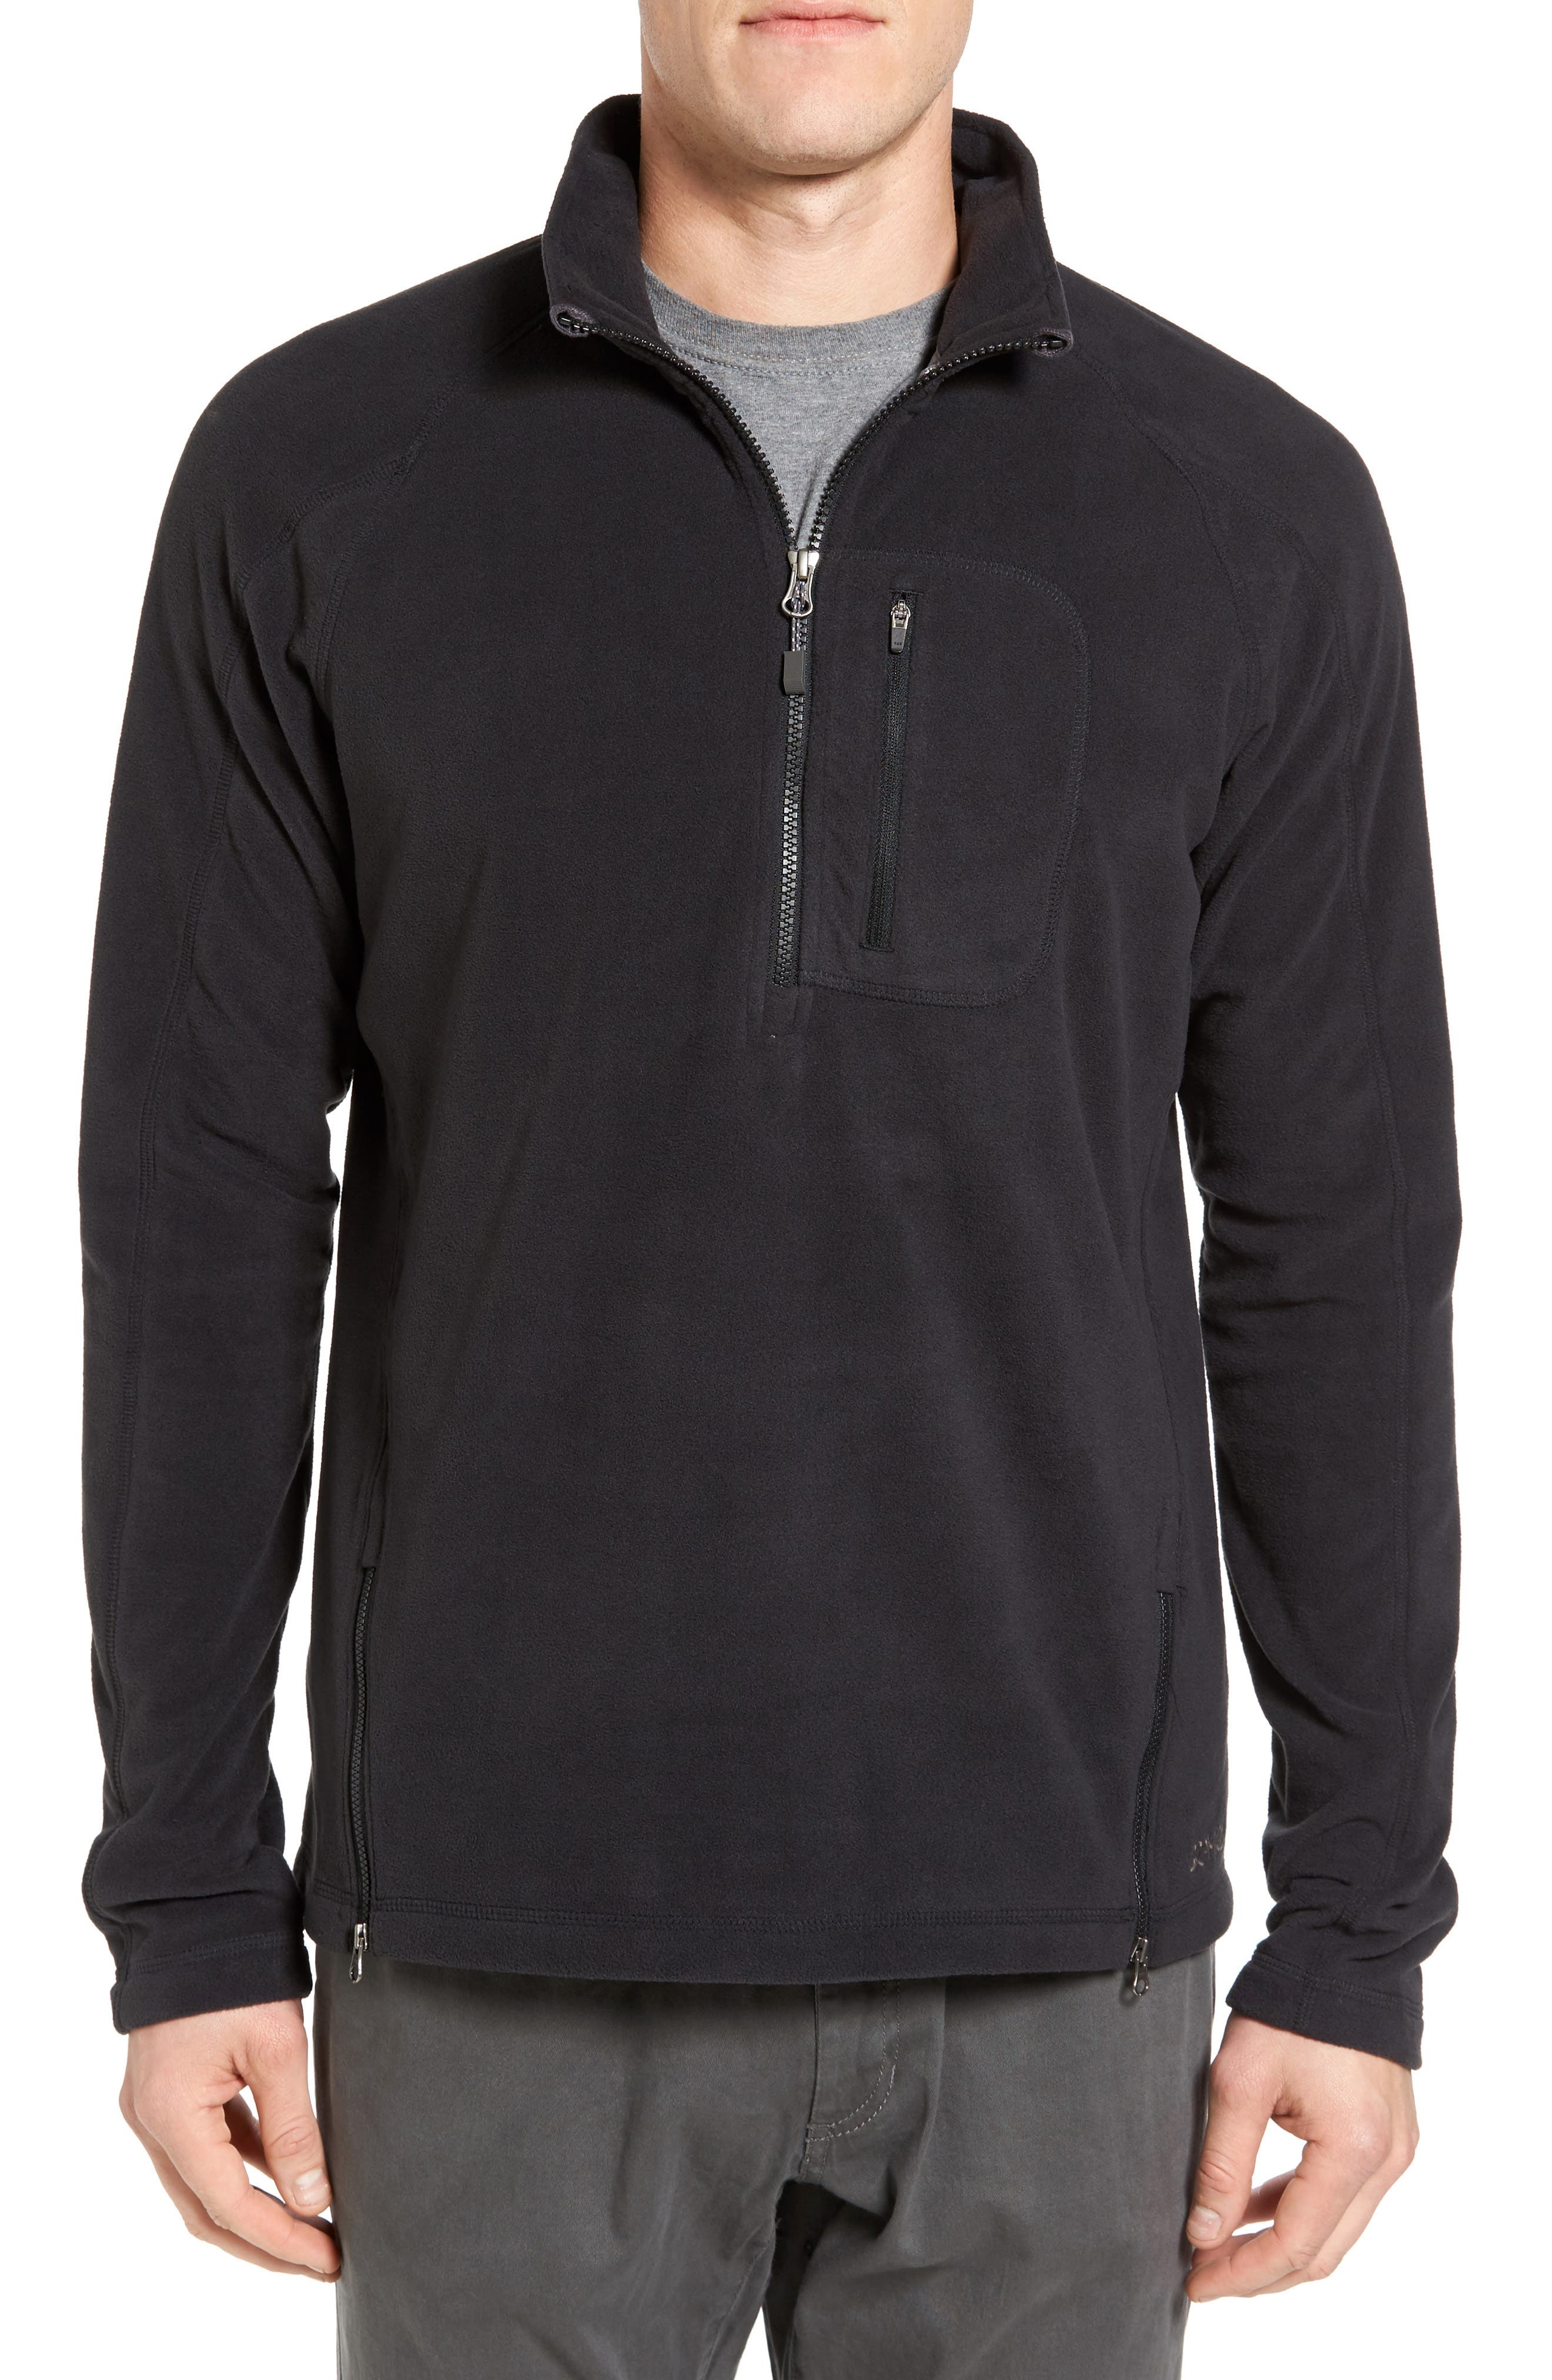 Utility Quarter Zip Fleece Sweater,                             Main thumbnail 1, color,                             002